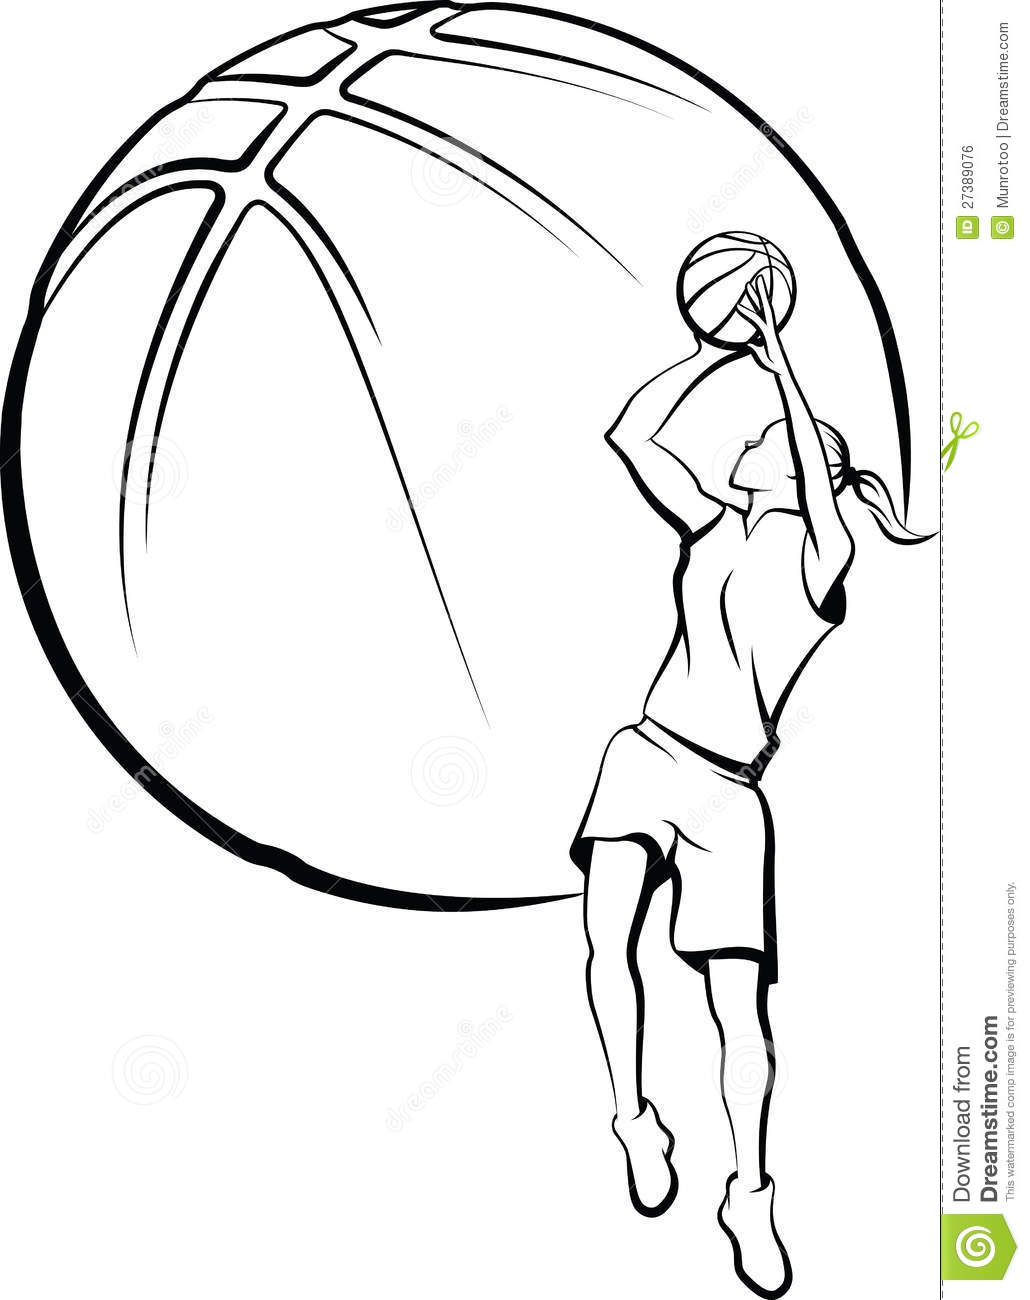 1030x1300 Cool Basketball Drawings Amusing Basketball Logo Clipart 67